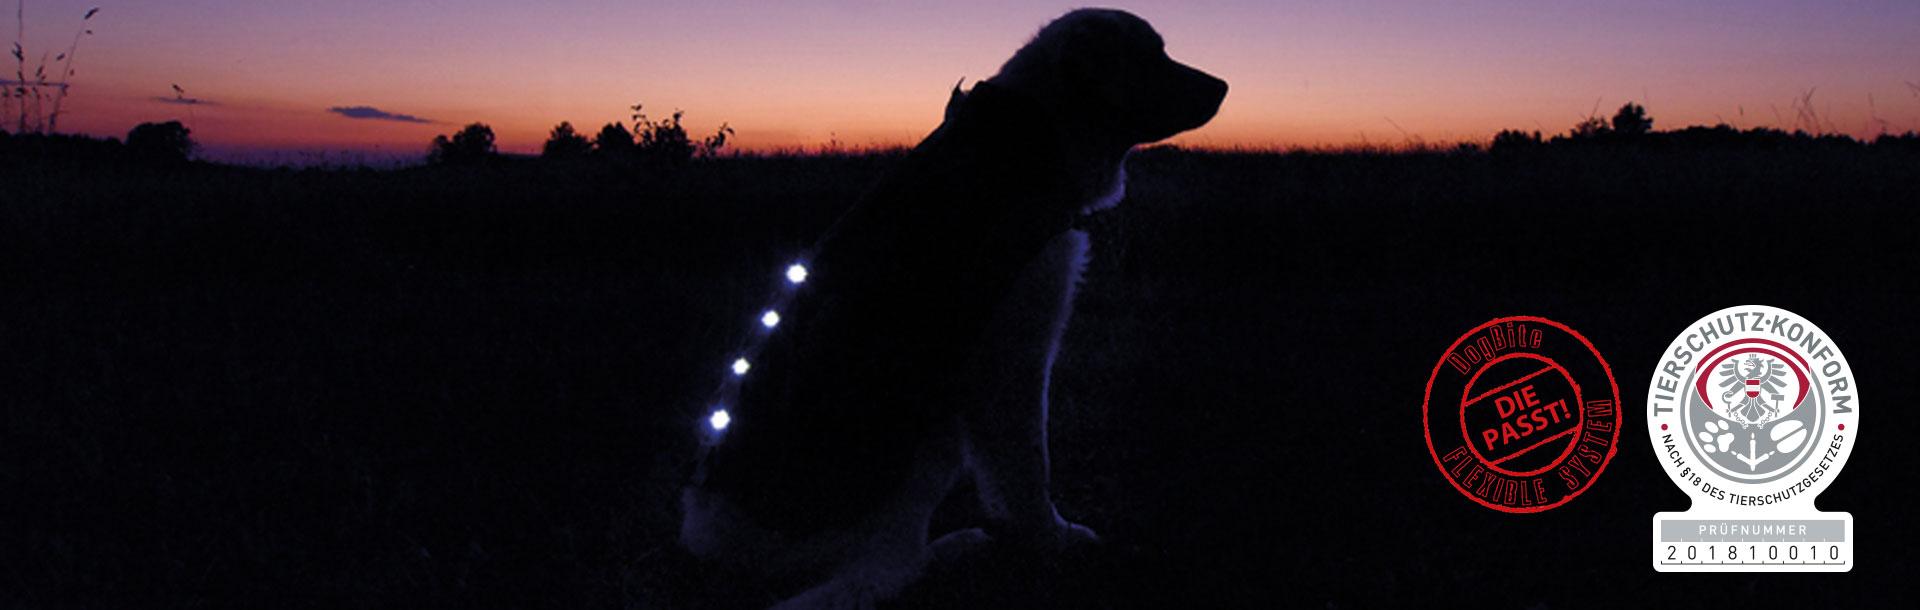 DogBite Hundejacken, Bild 3